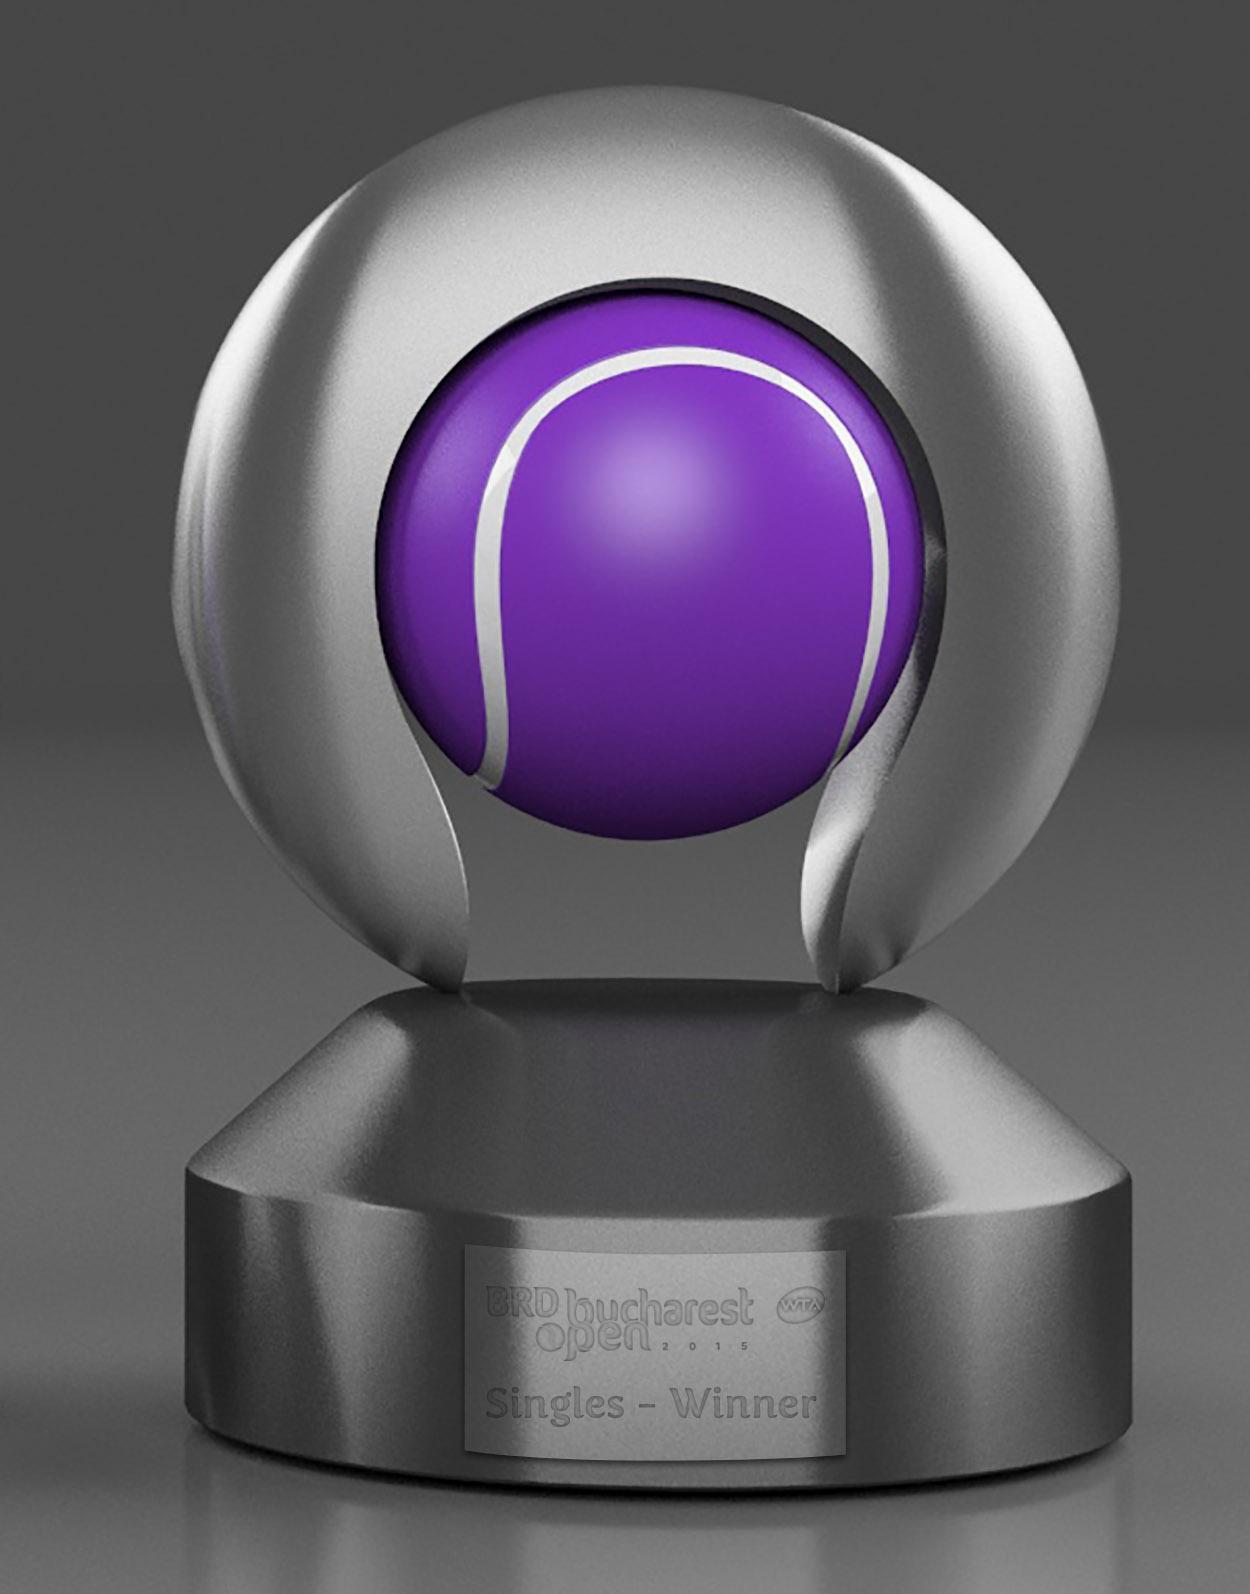 BRD Bucharest Open Trophy